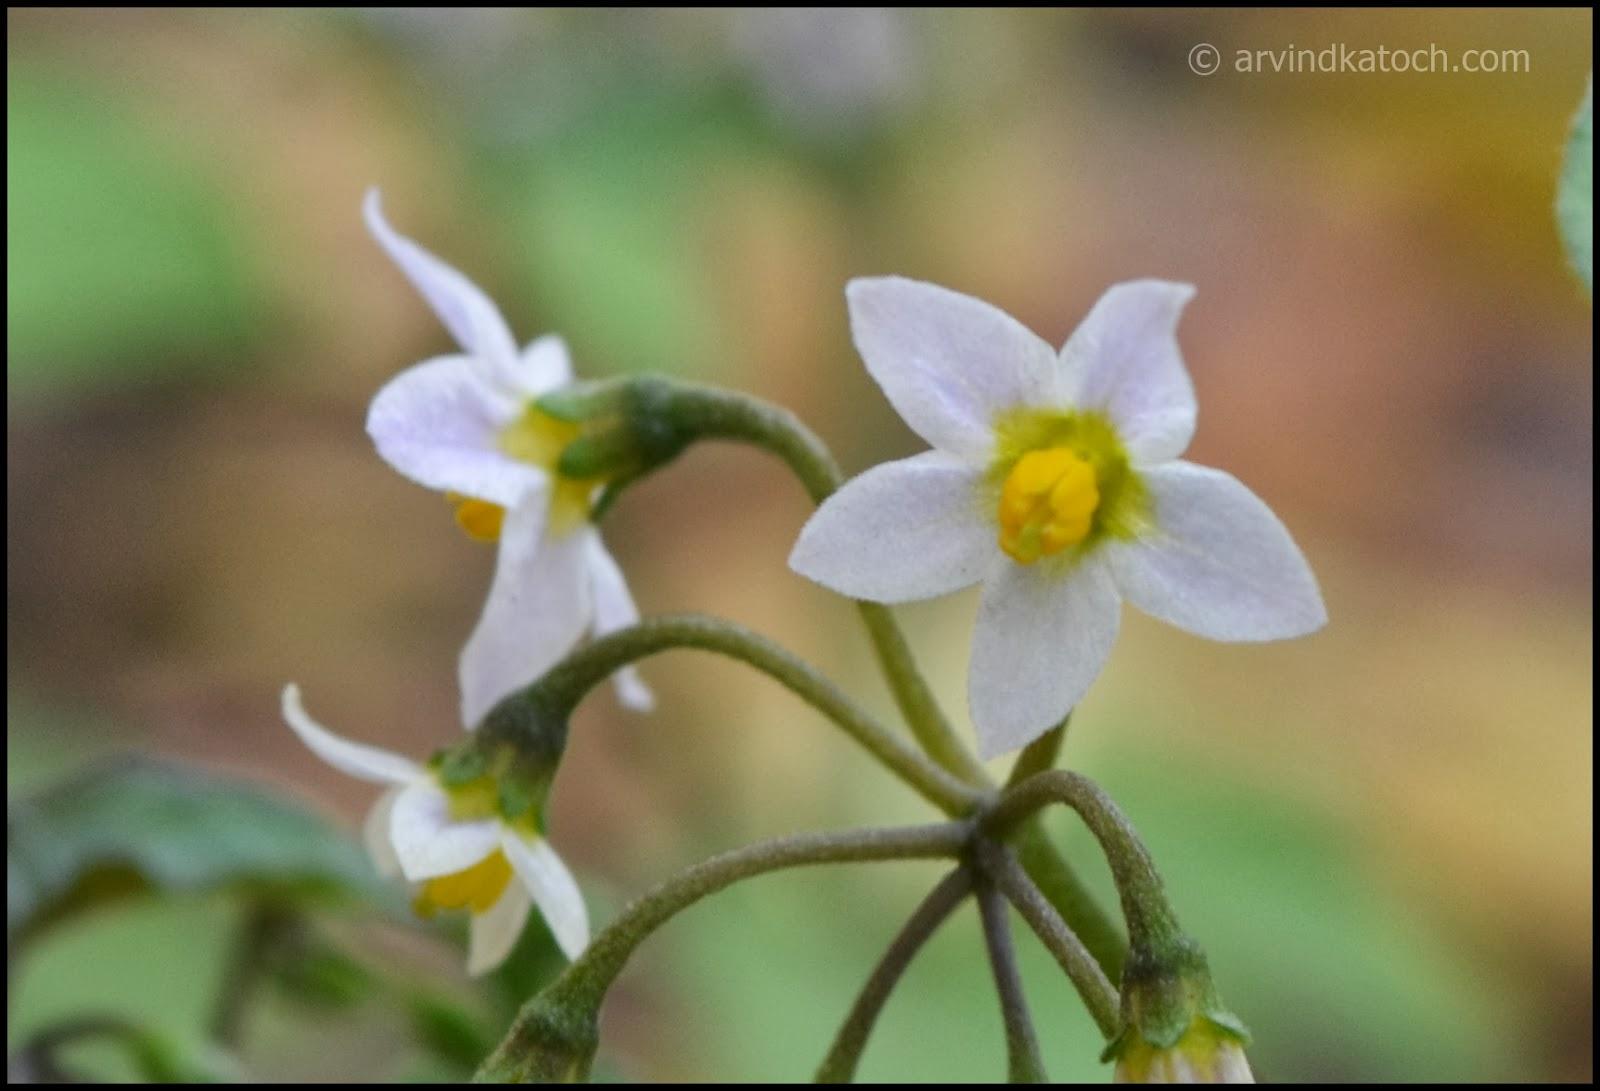 white flowers, yellow center, micro flowers